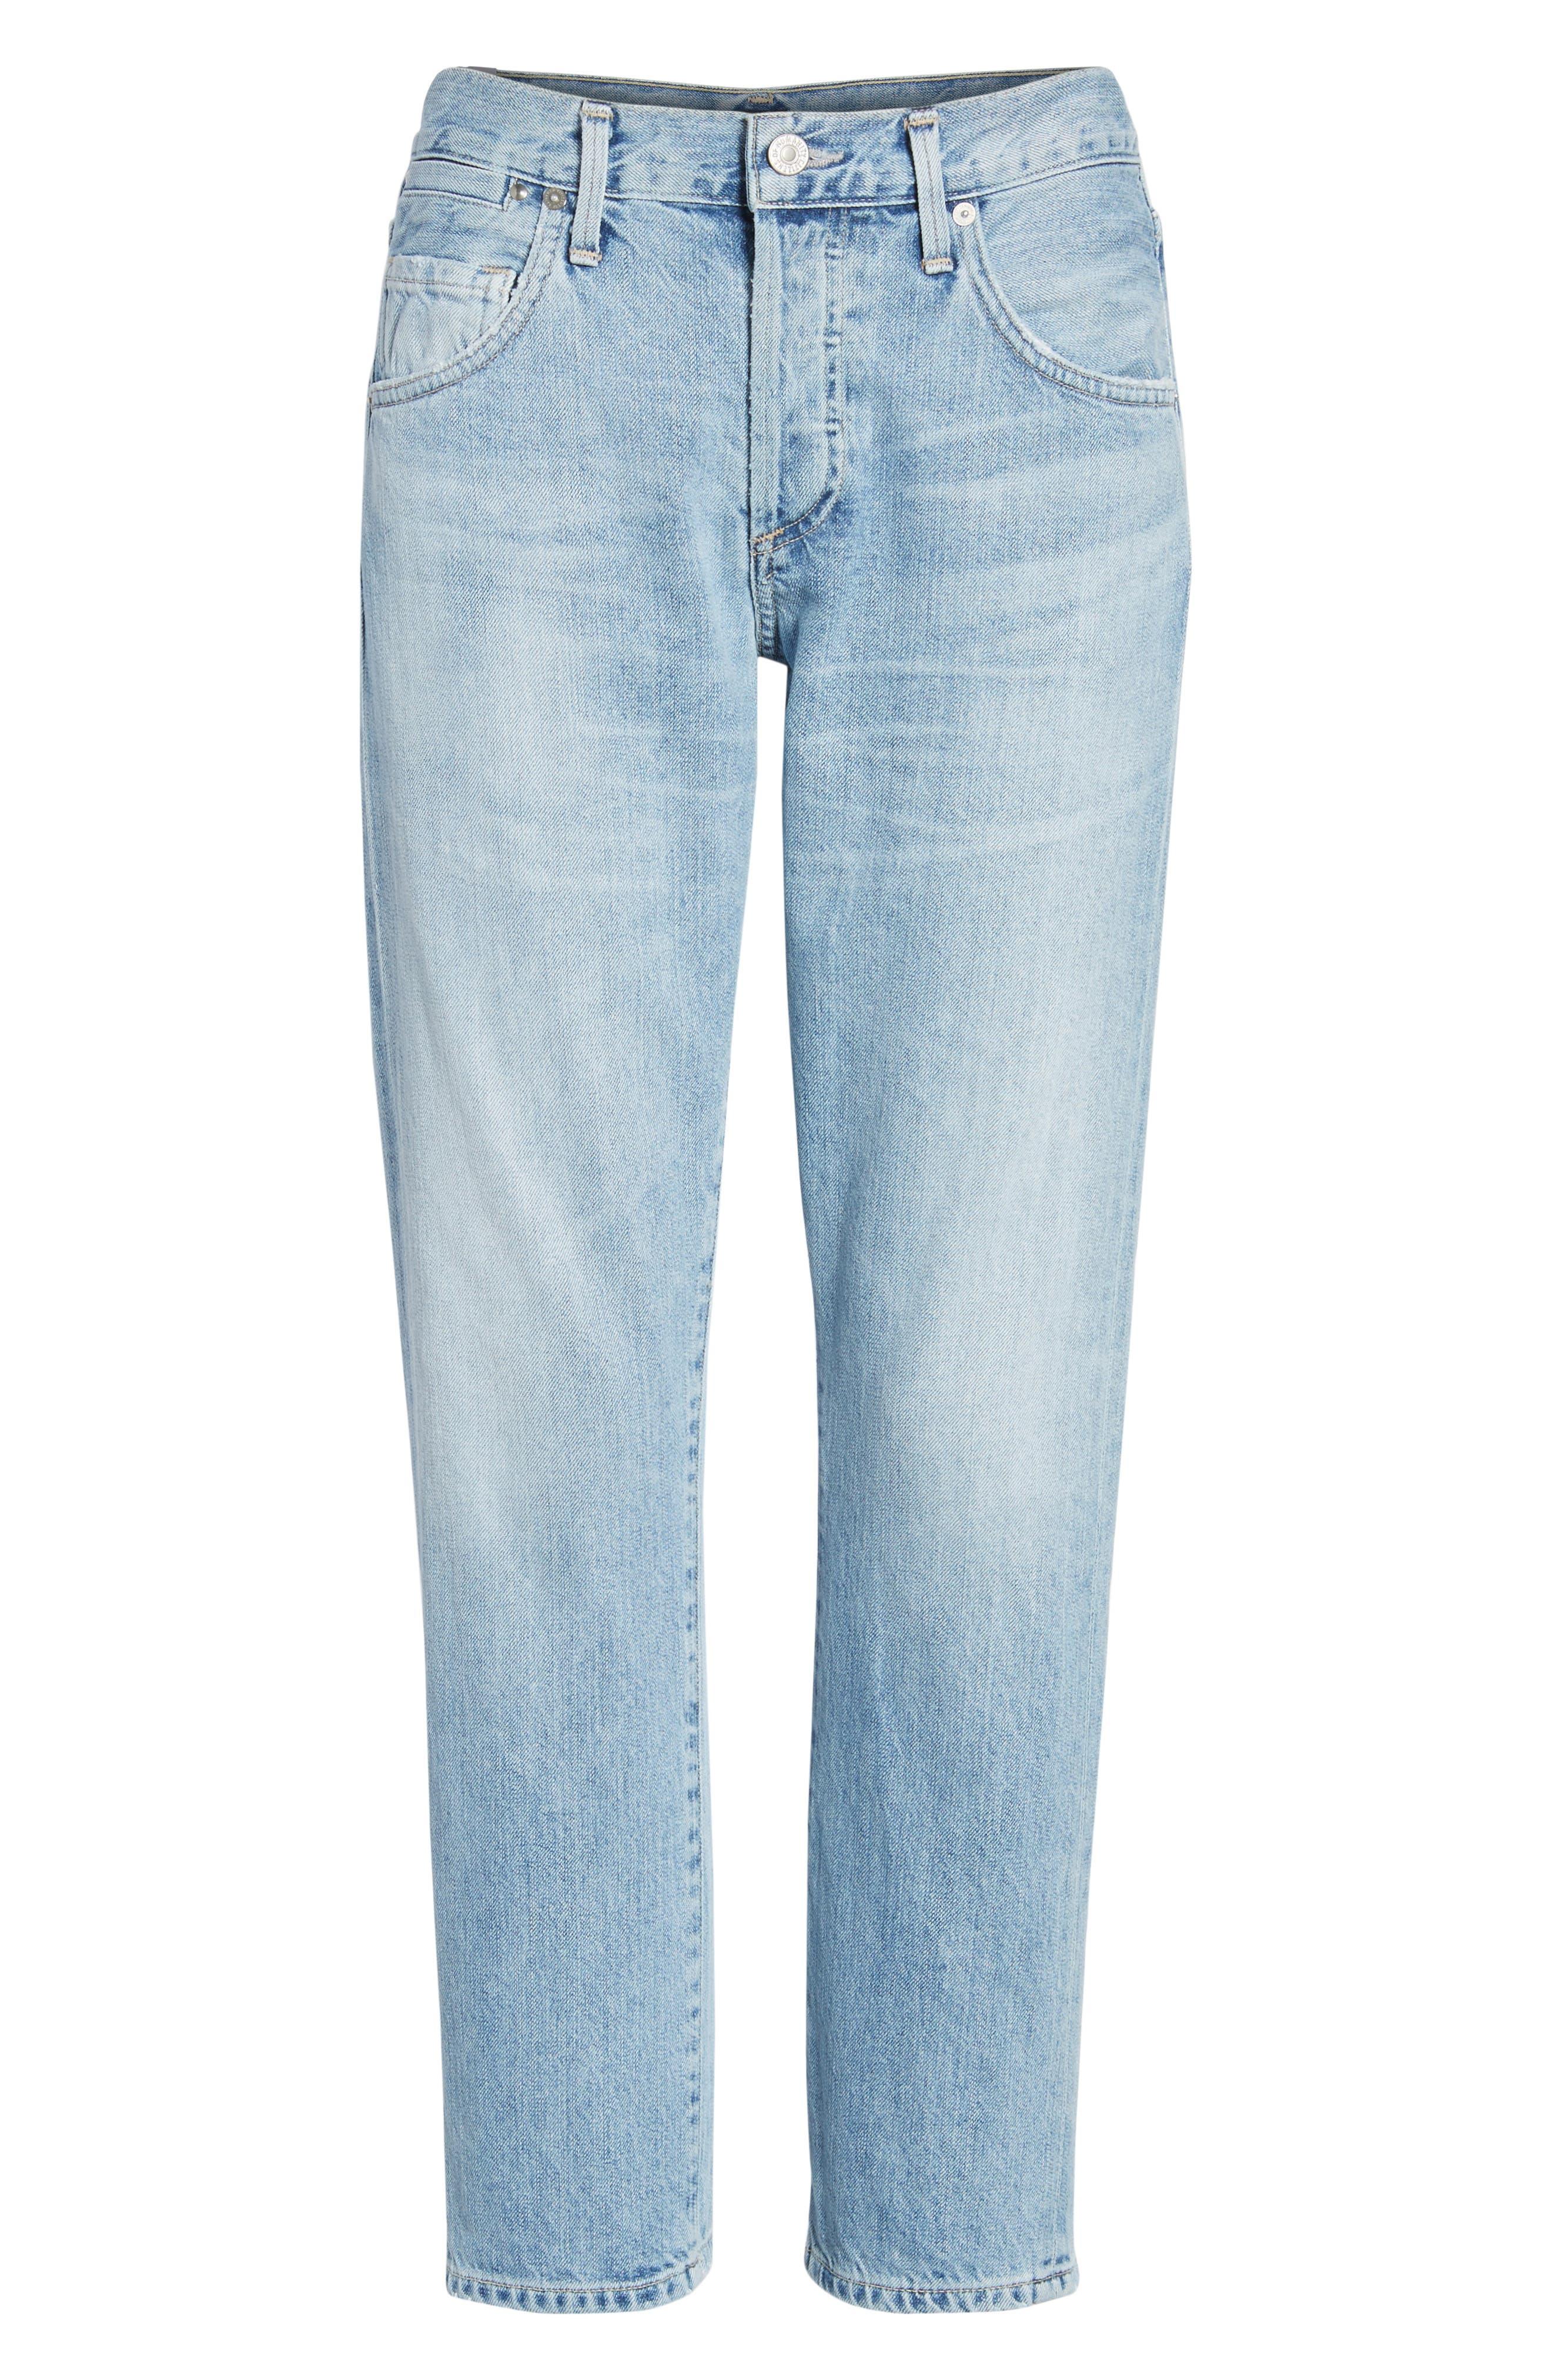 Emerson Slim Fit Boyfriend Jeans,                             Alternate thumbnail 7, color,                             Sunday Morning